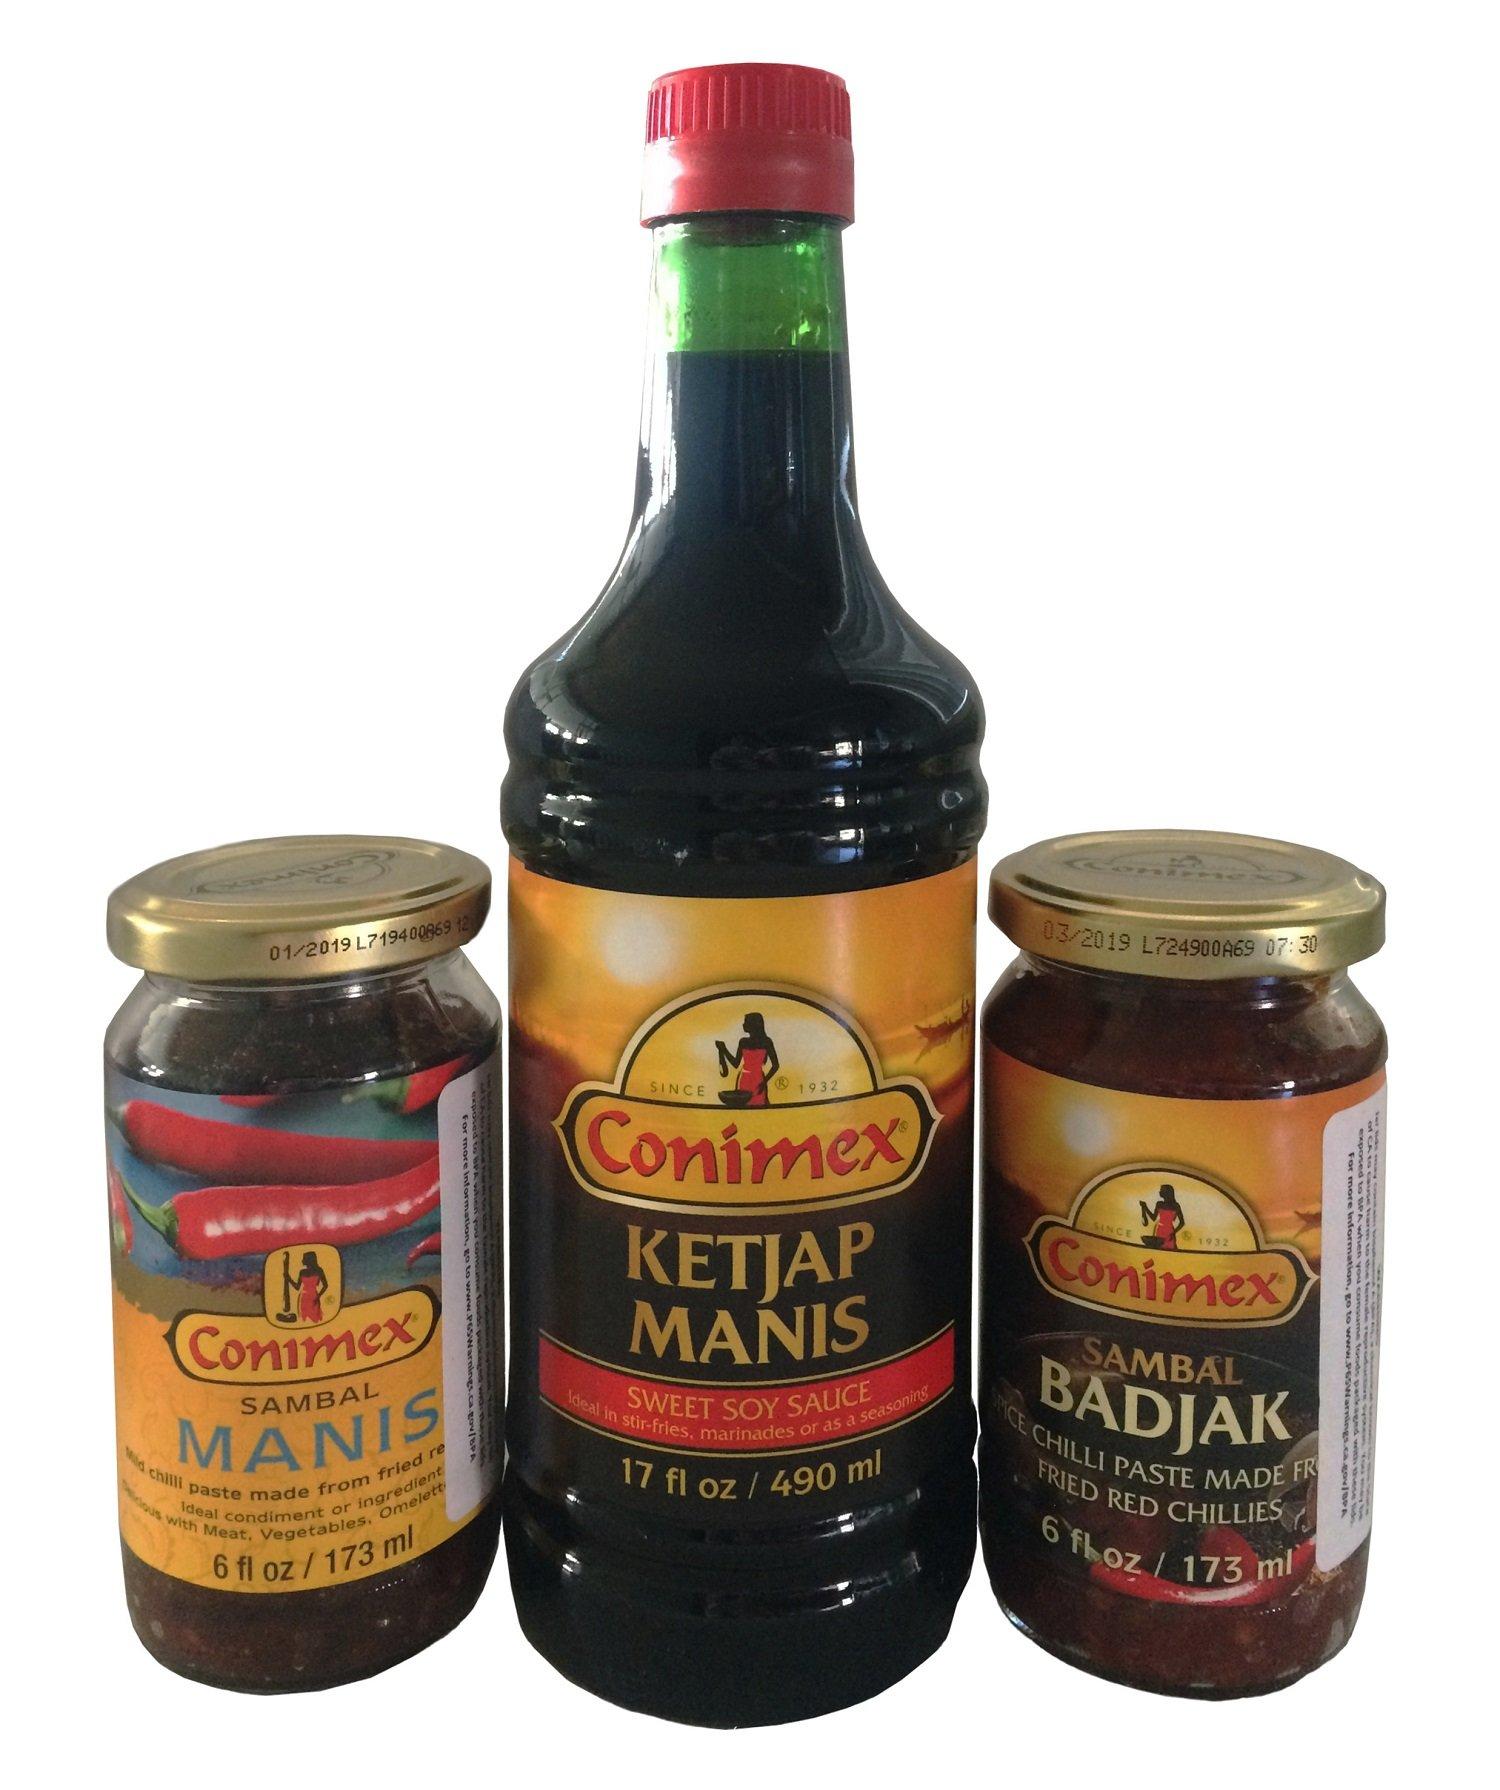 Conimex Products Variety - Conimex Ketjap Manis, Conimex Sambal Manis and Conimex Sambal Badjak by World Food Mission